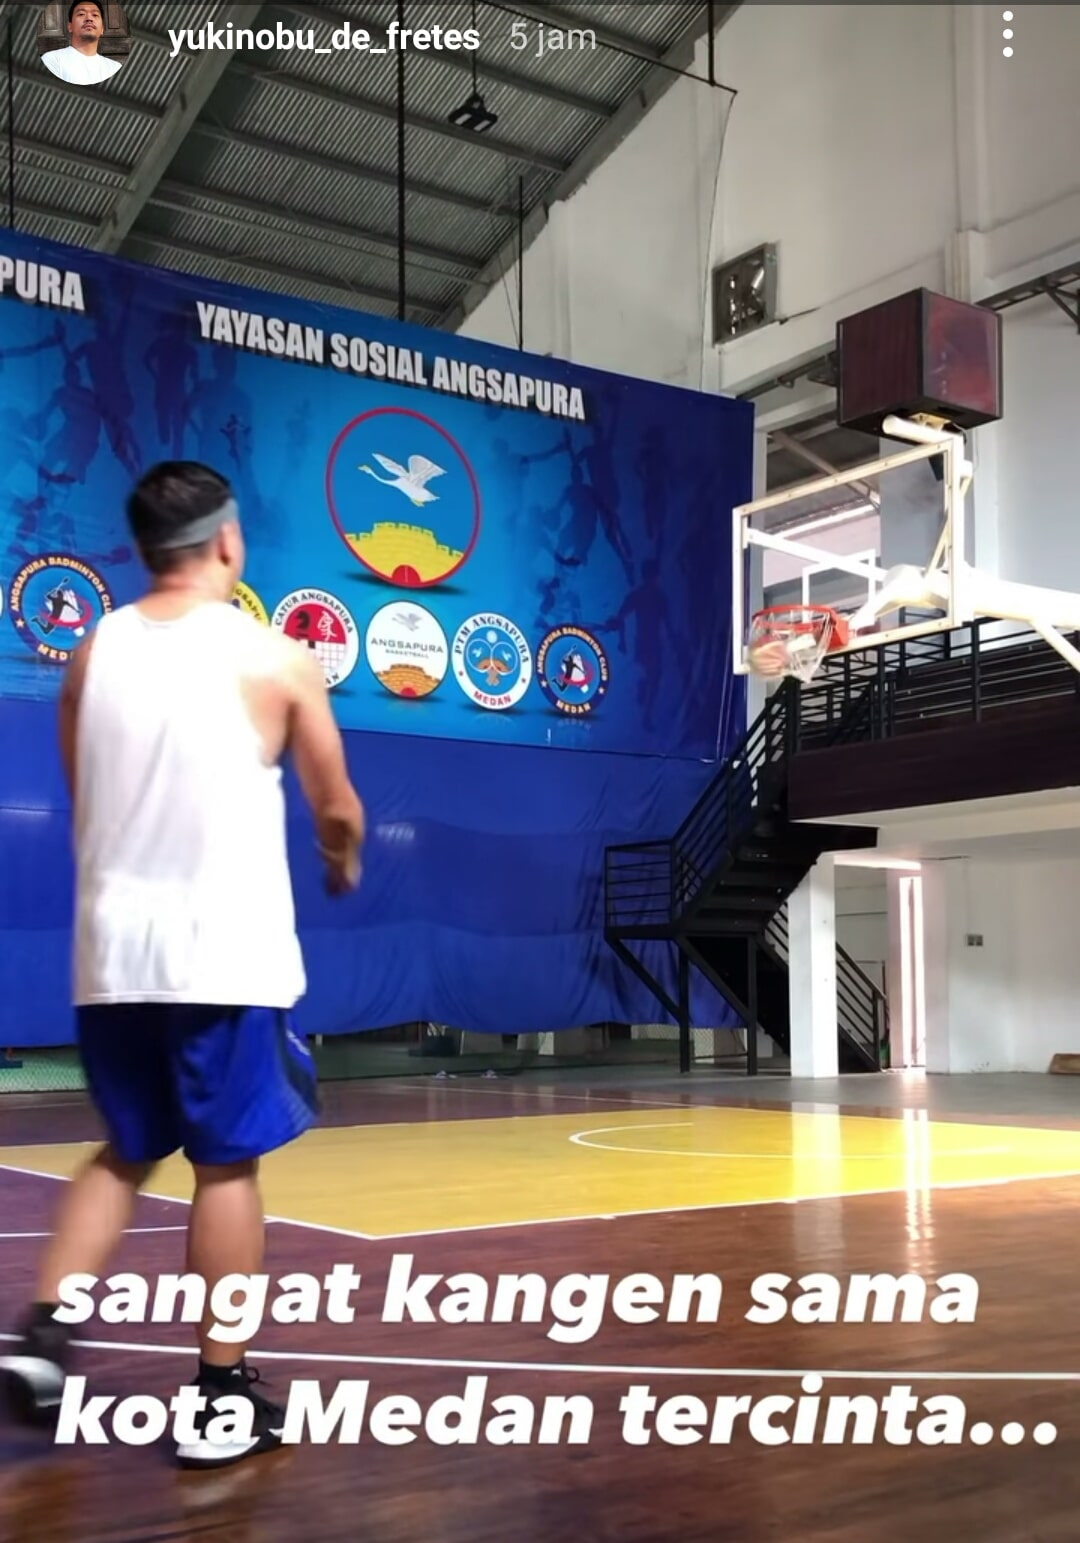 Postingan <a href='https://jambi.tribunnews.com/tag/nobu' title='Nobu'>Nobu</a>, sebuah video di Story Instagram dan ucapan kangen <a href='https://jambi.tribunnews.com/tag/medan' title='Medan'>Medan</a>